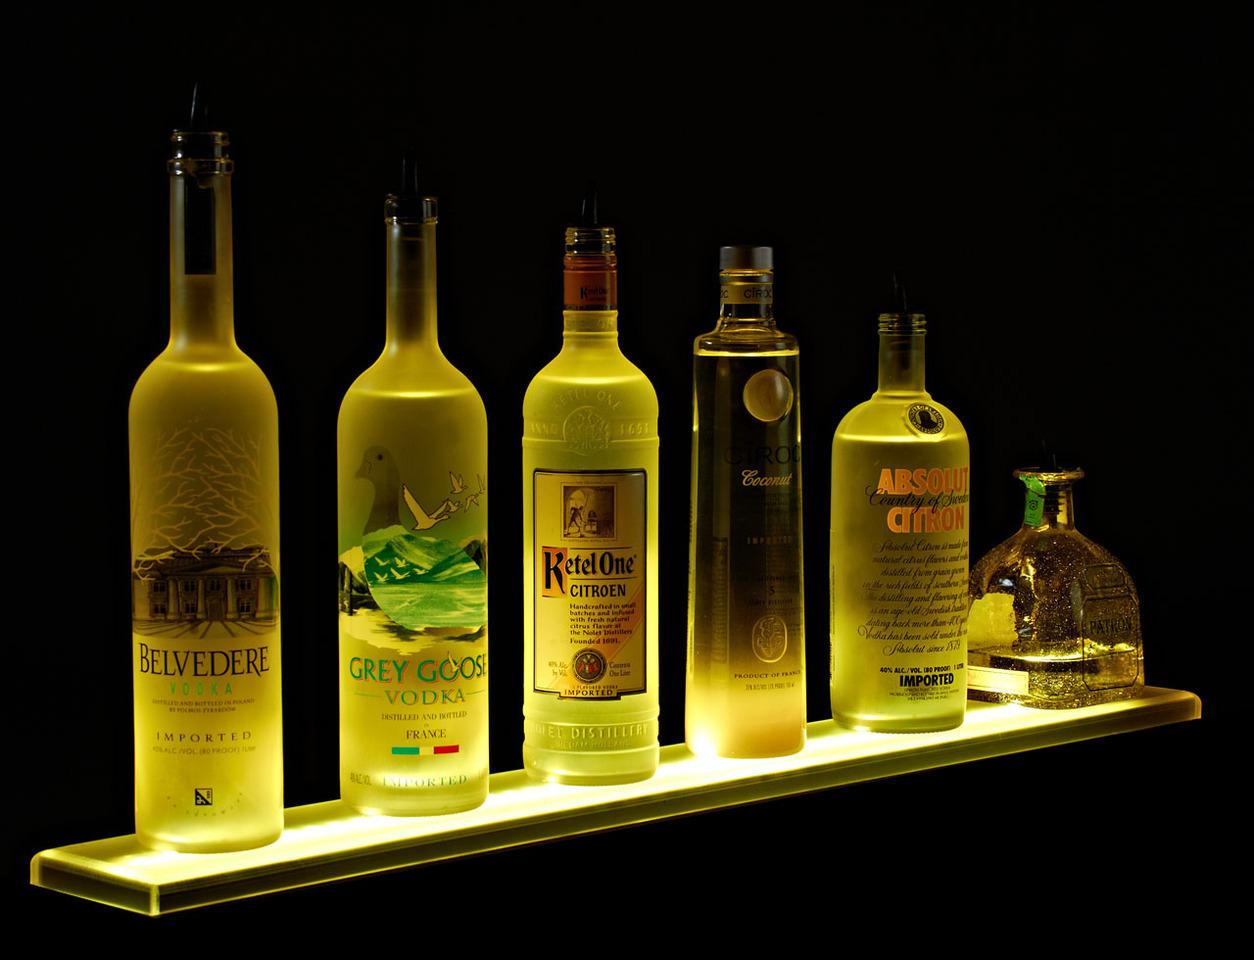 led-liquor-shelves-display-bottle-glorifier-glorifier-led-bar-bottle-displays-led-bottle-display-led-bottle-displays-led-glorifiers-liquor-shelves-nightclubshop-lat-panel.jpg